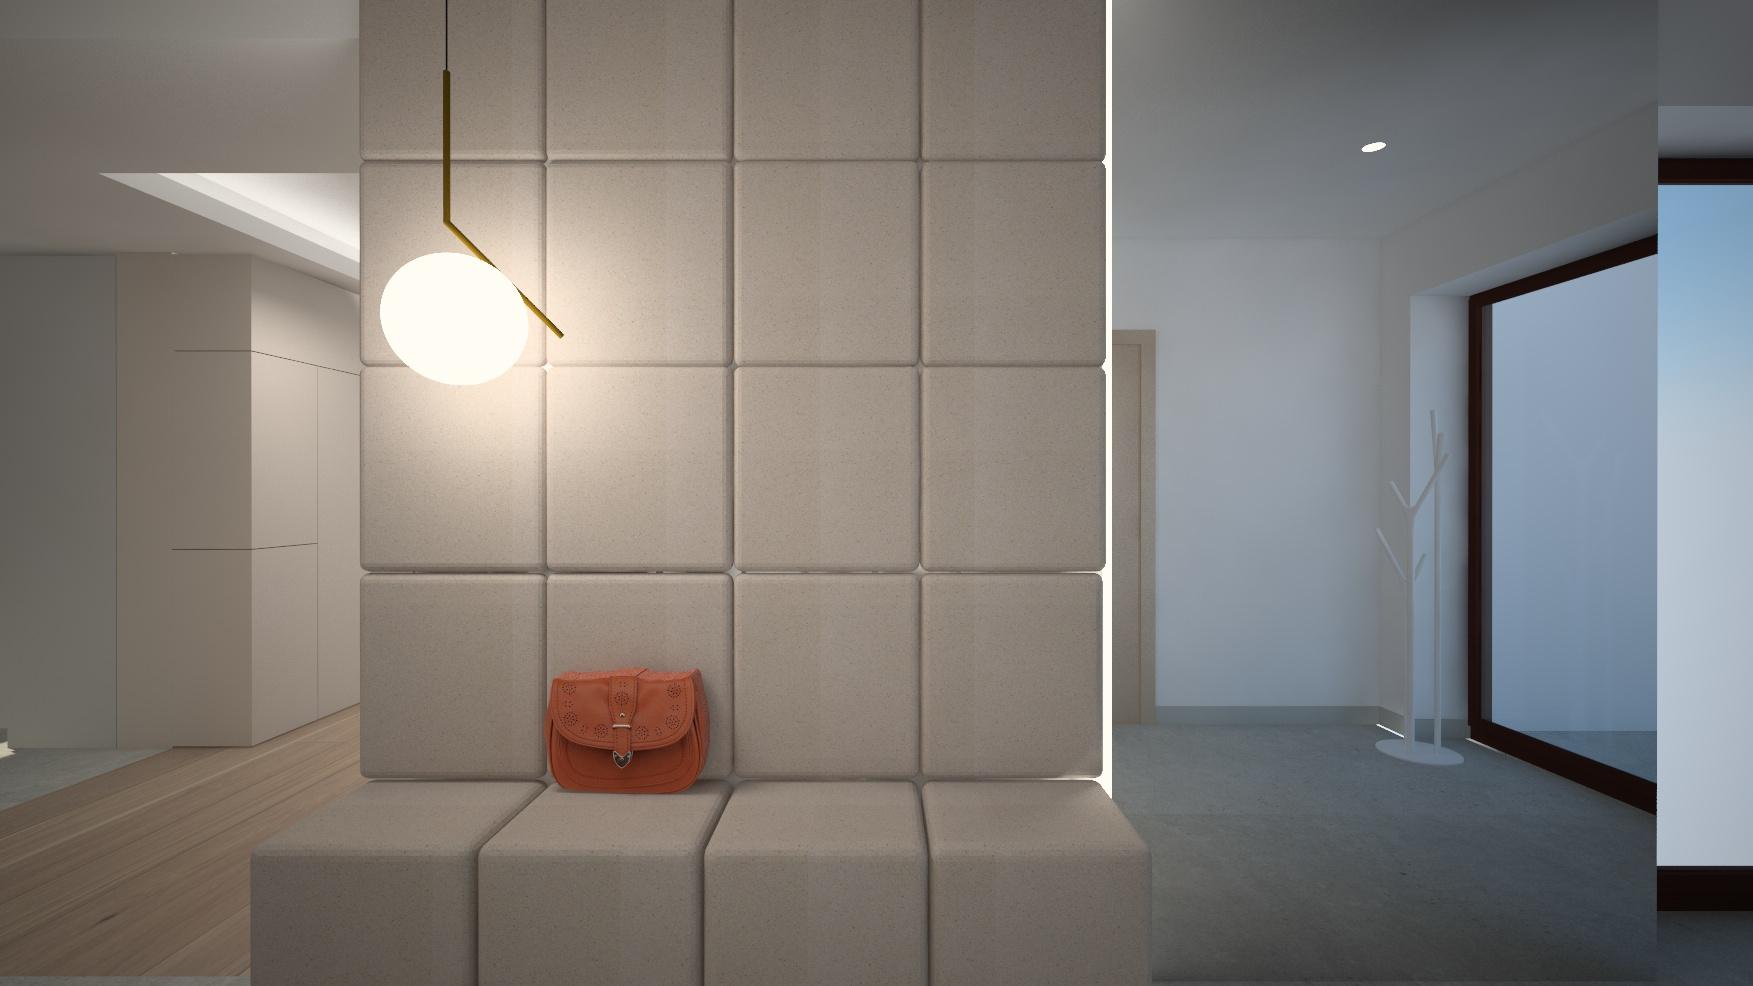 siedzisko-lampa flos-pomysł na hol.jpg